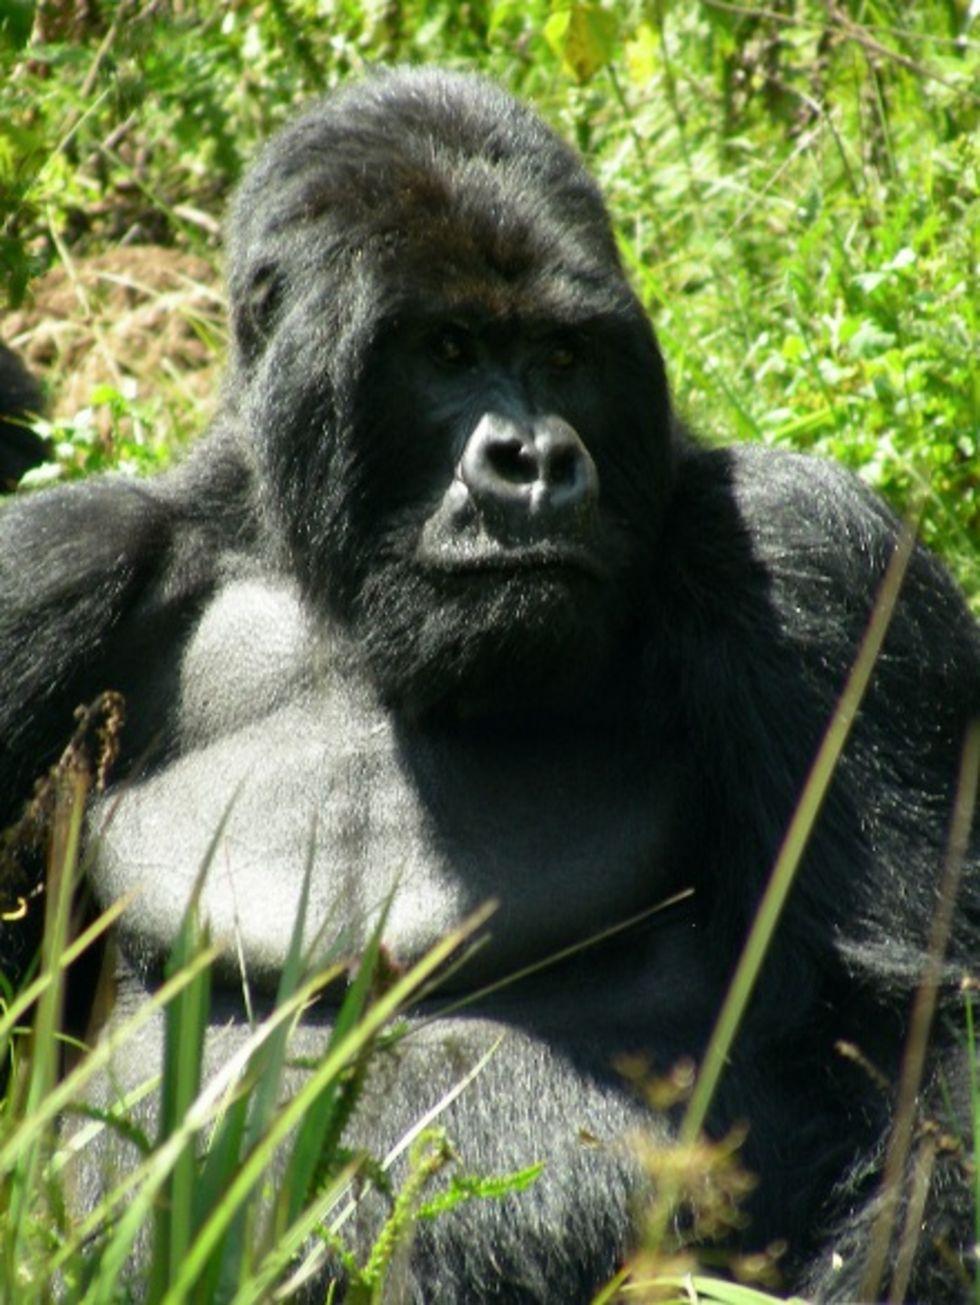 Gorillor i Kongo-Brazzaville döda av ebola-virus